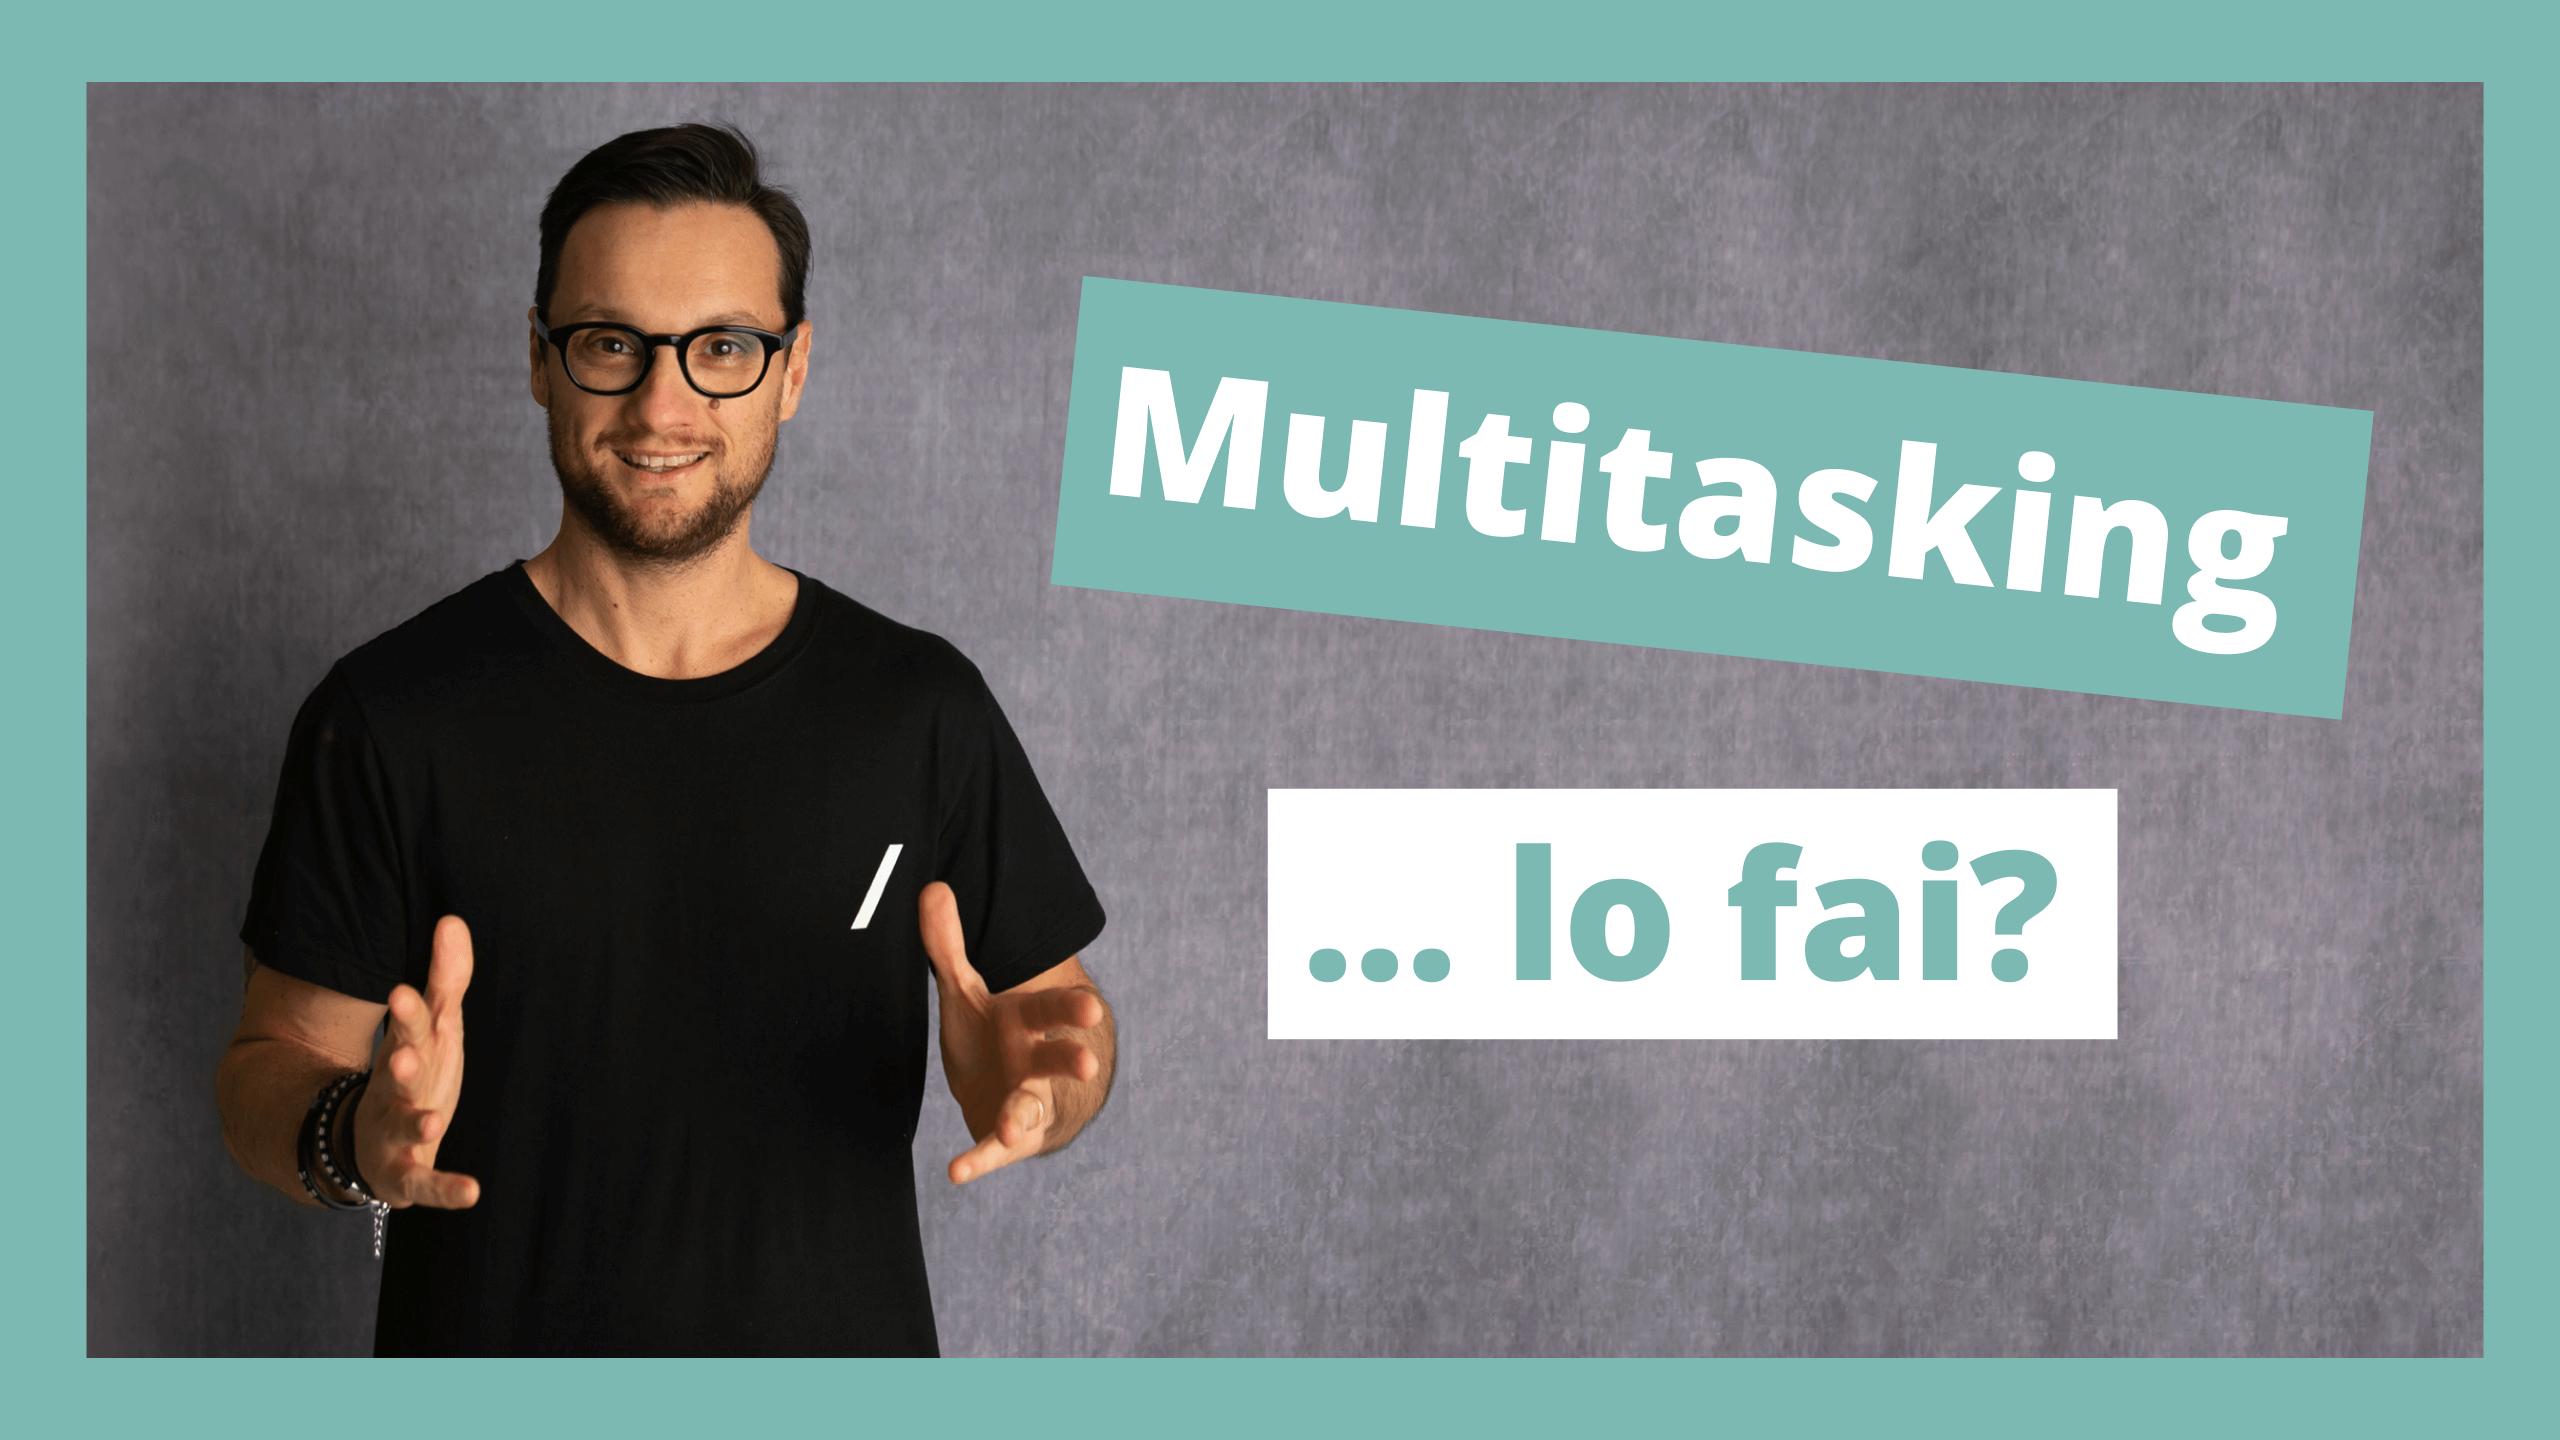 Multitasking...lo fai? - Hacker Photographer